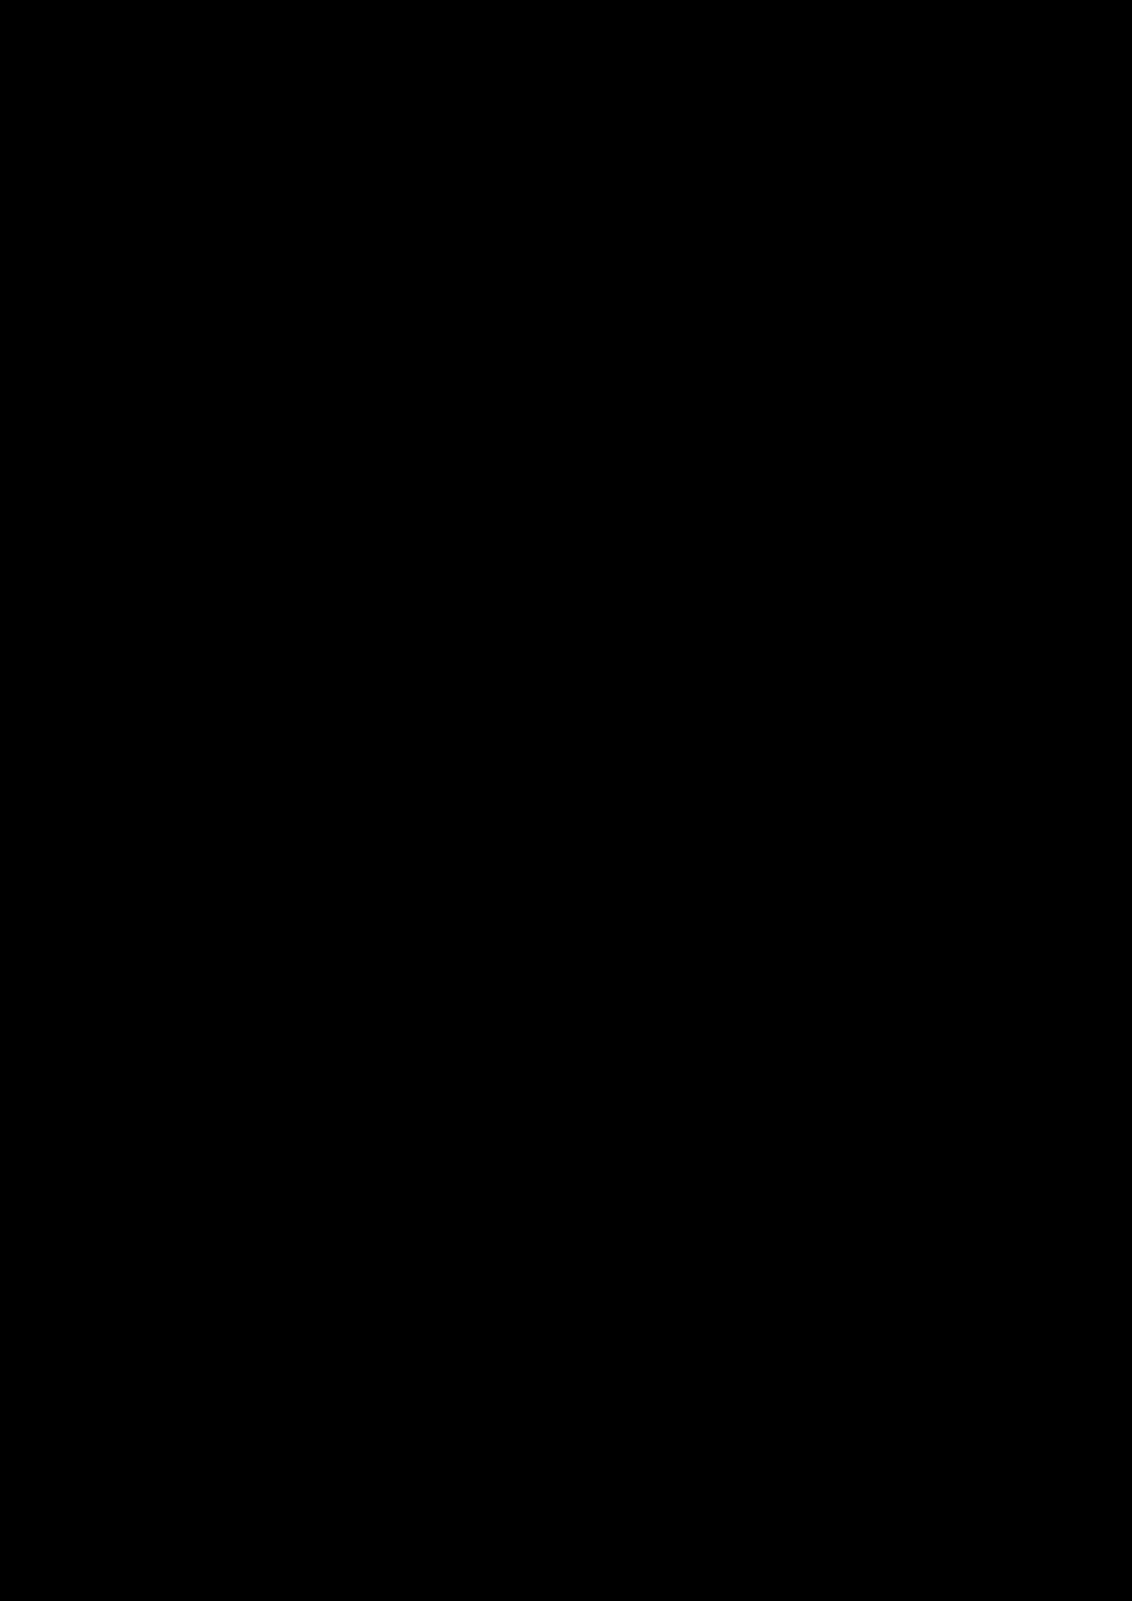 Okean Pustotyi slide, Image 5